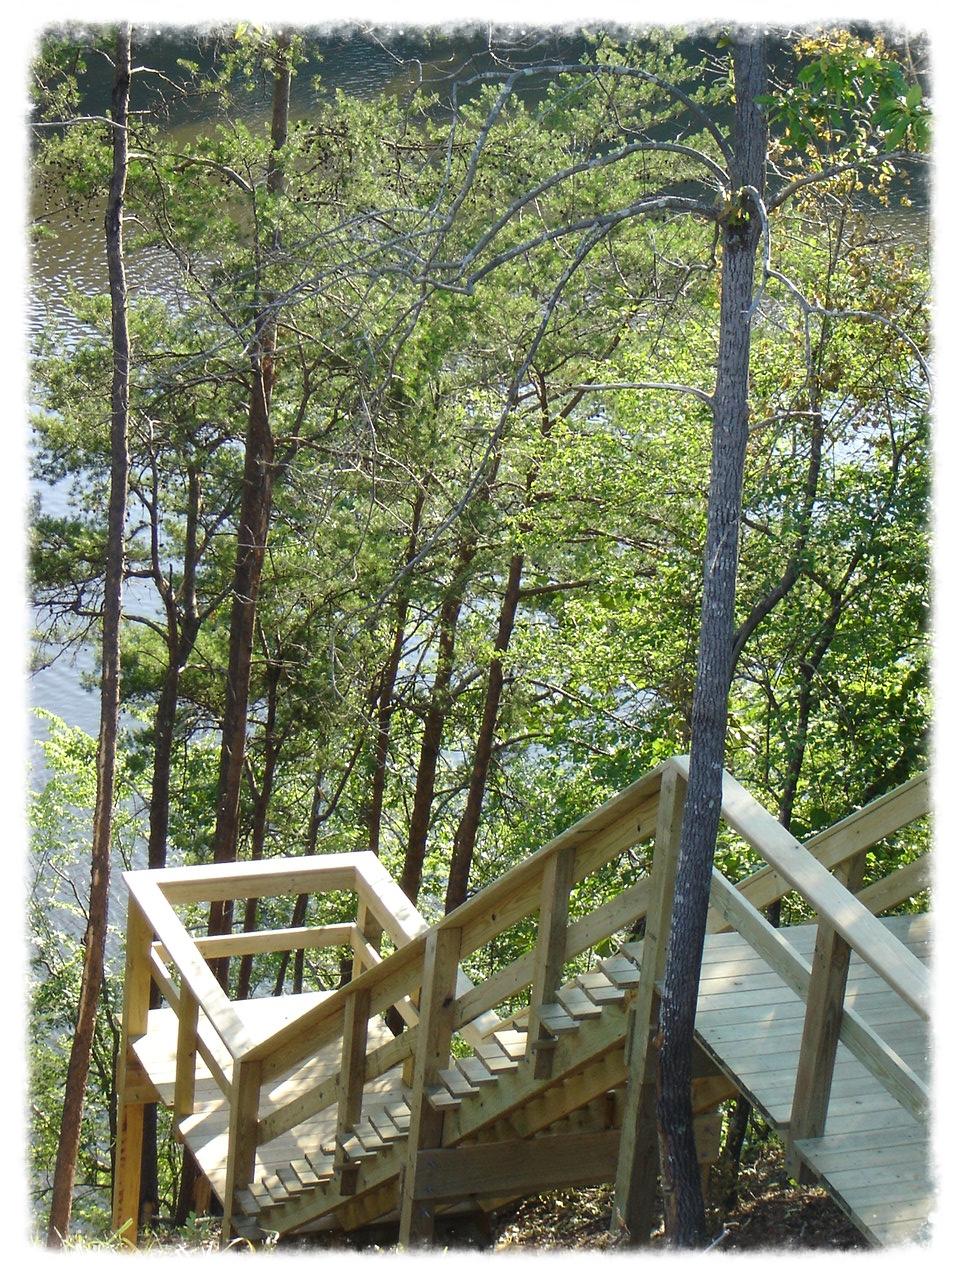 Wood Boardwalk and Handrail